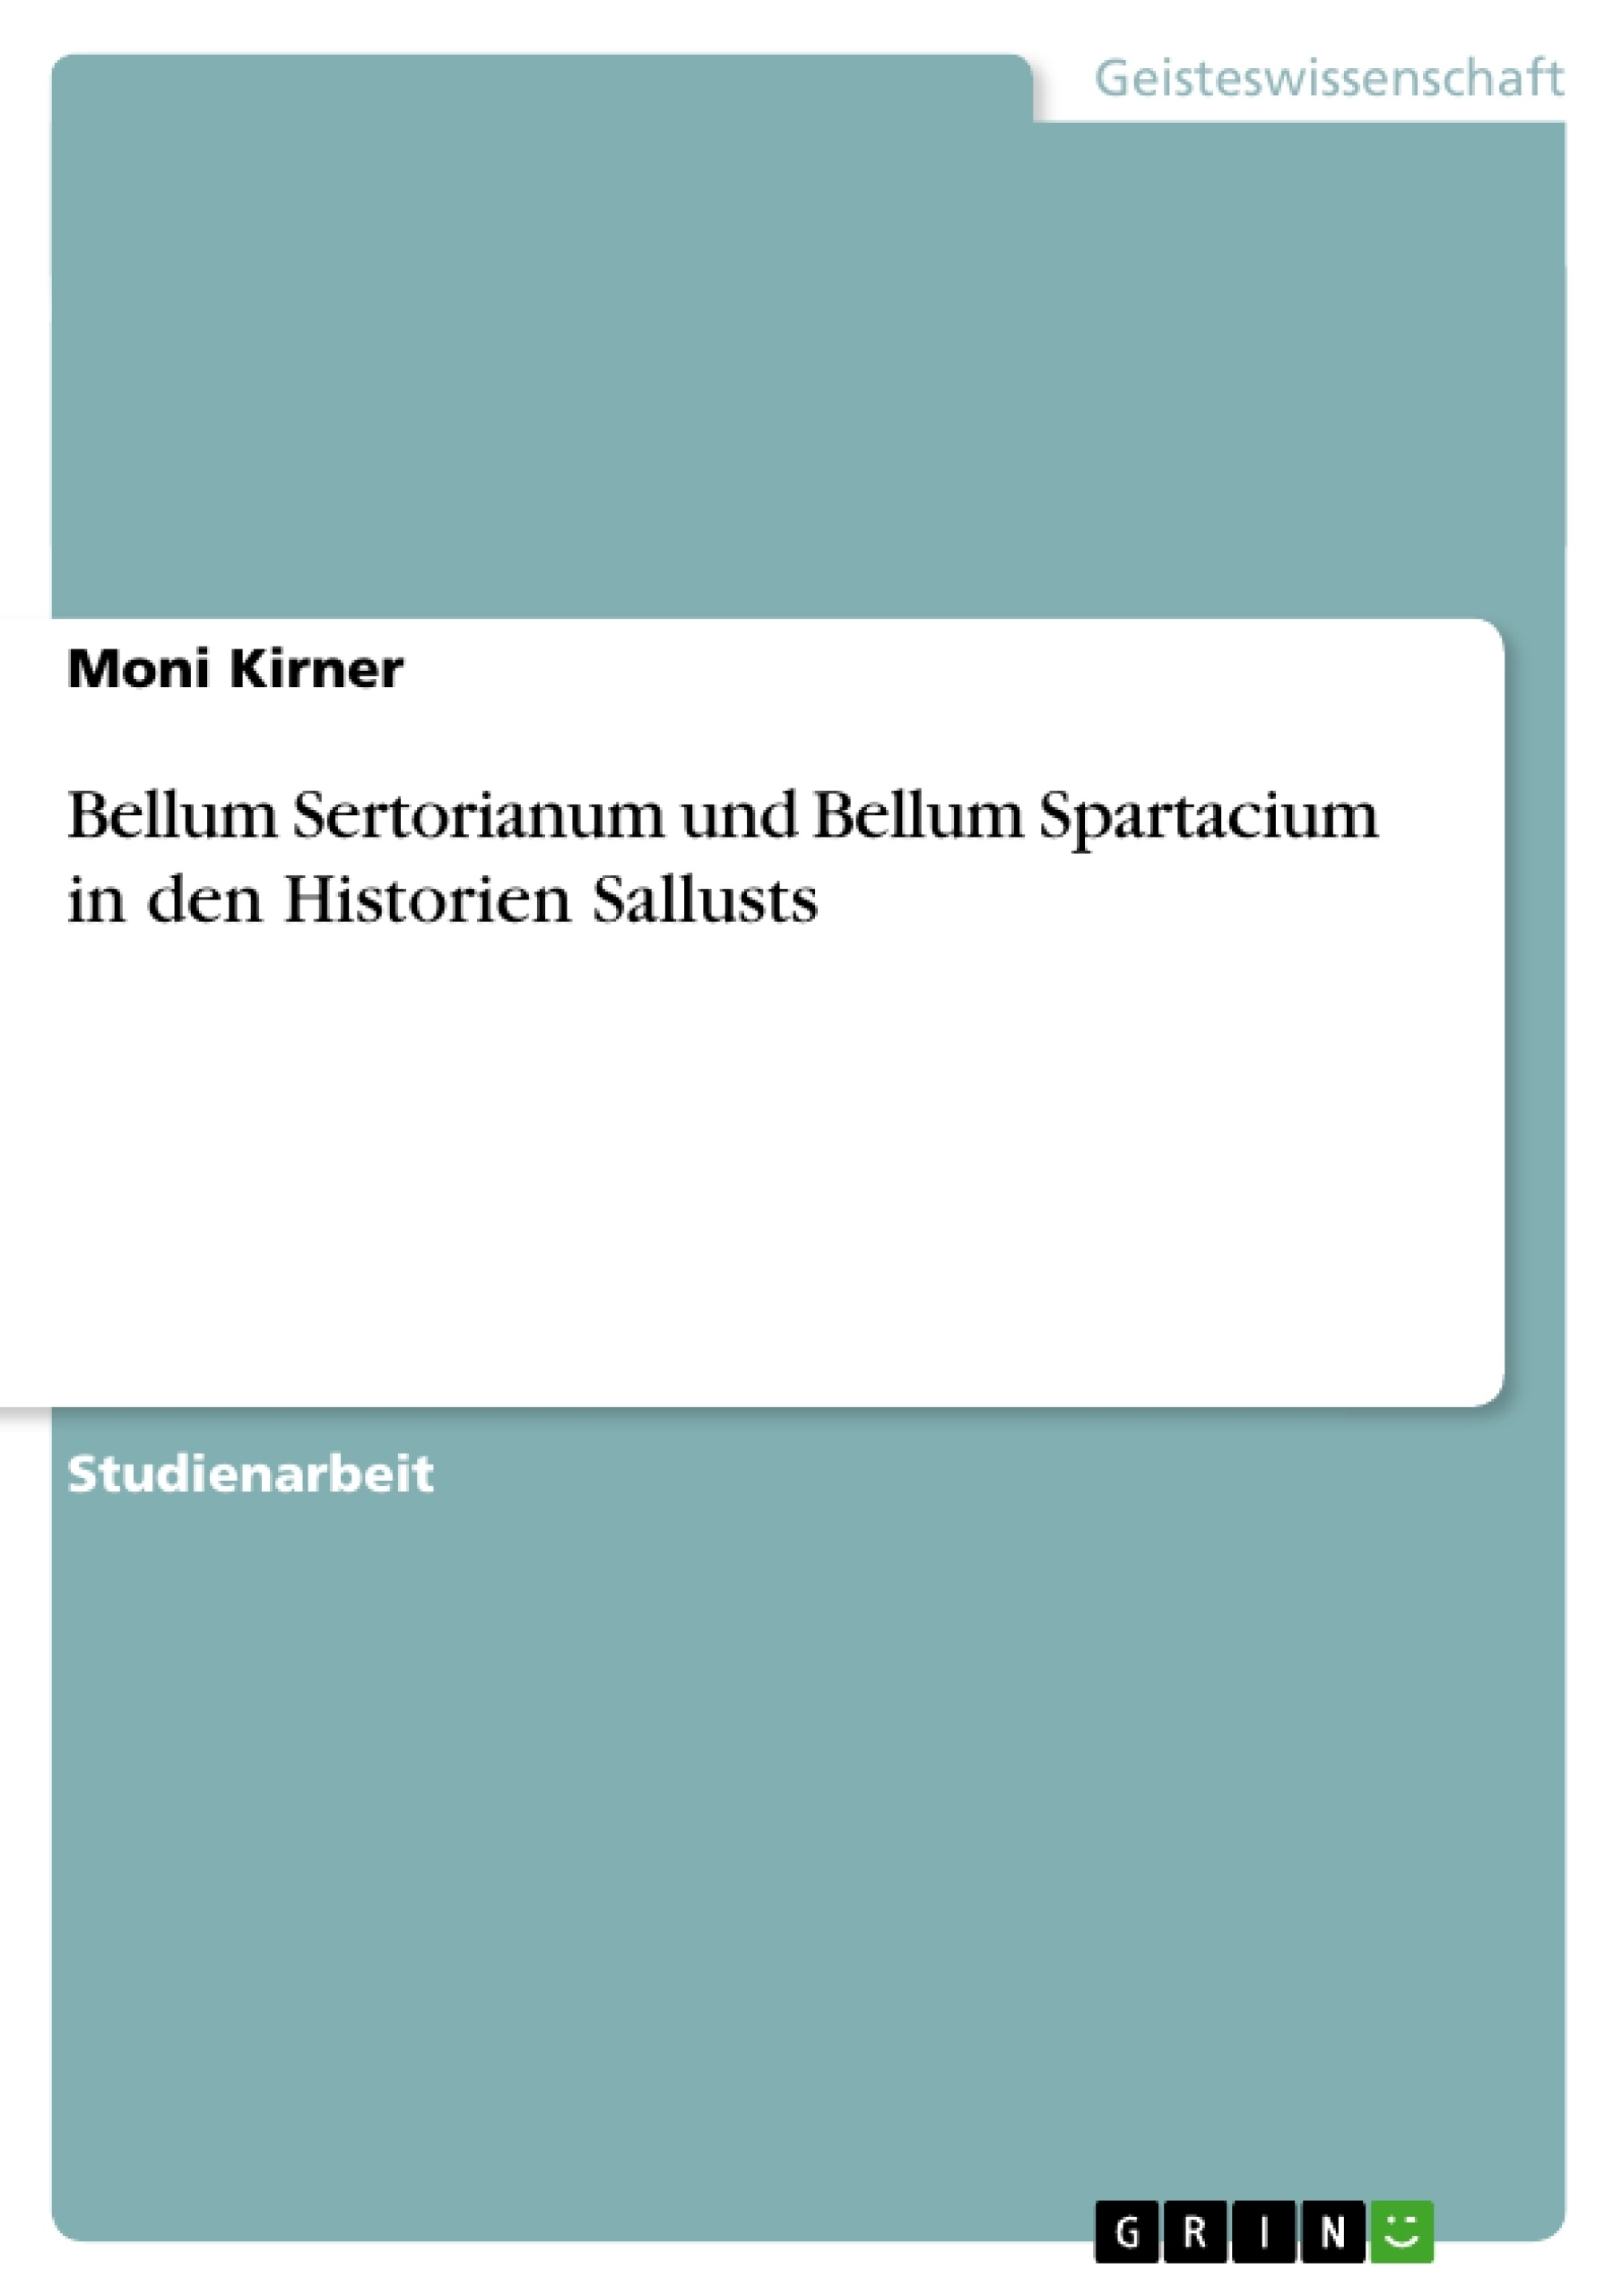 Titel: Bellum Sertorianum und Bellum Spartacium in den Historien Sallusts